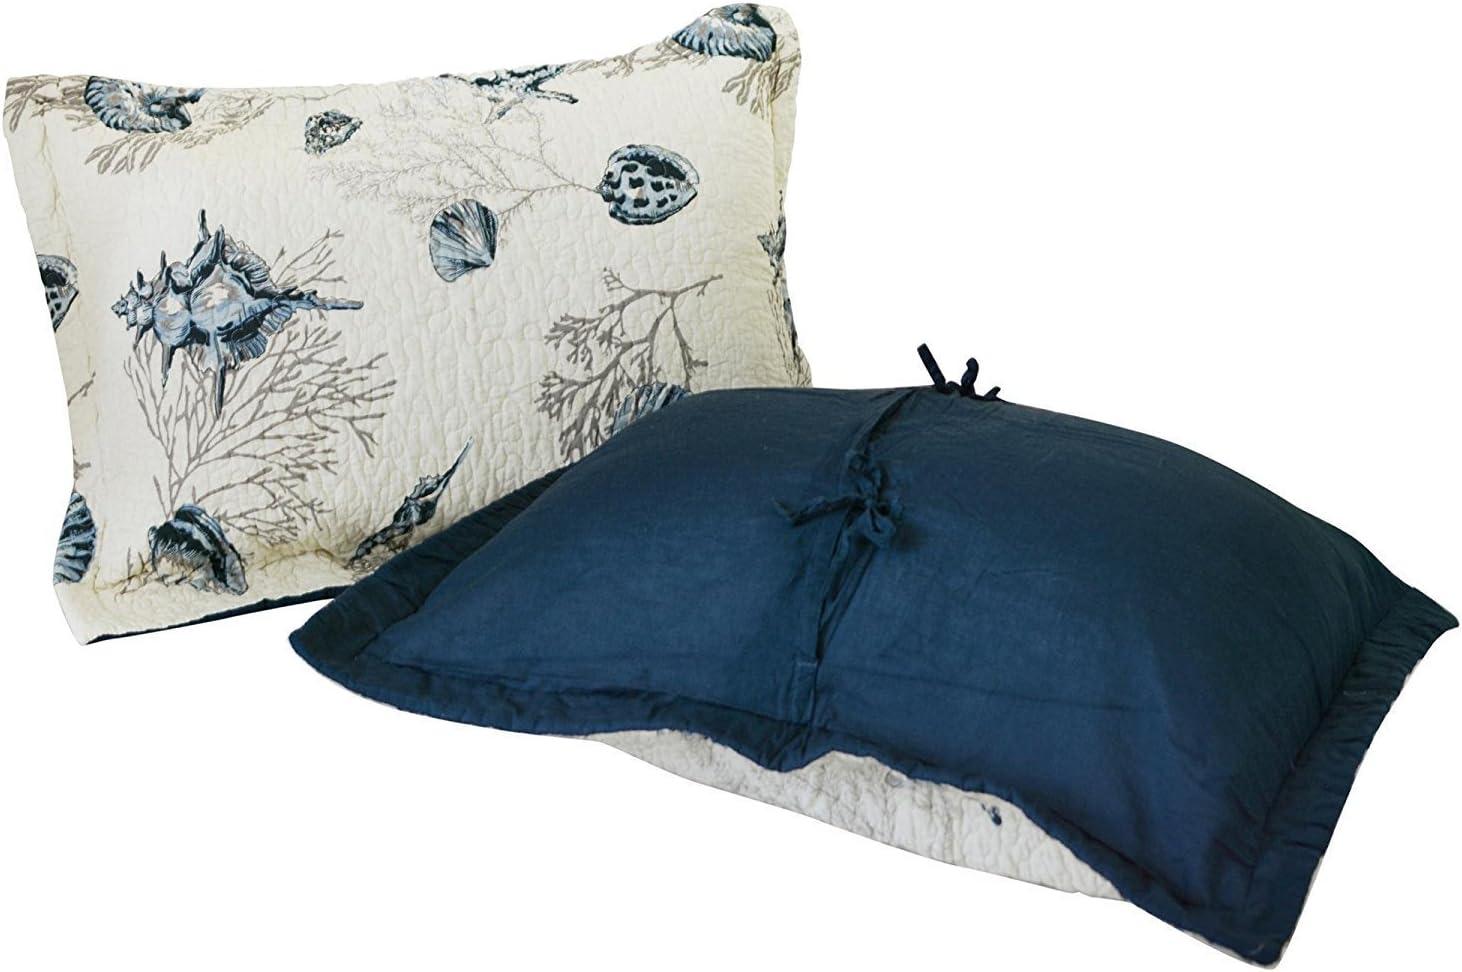 Brandream 100/% Cotton Pillow Cases Nautical Navy Blue Seashells Pillow Shams 2-Piece